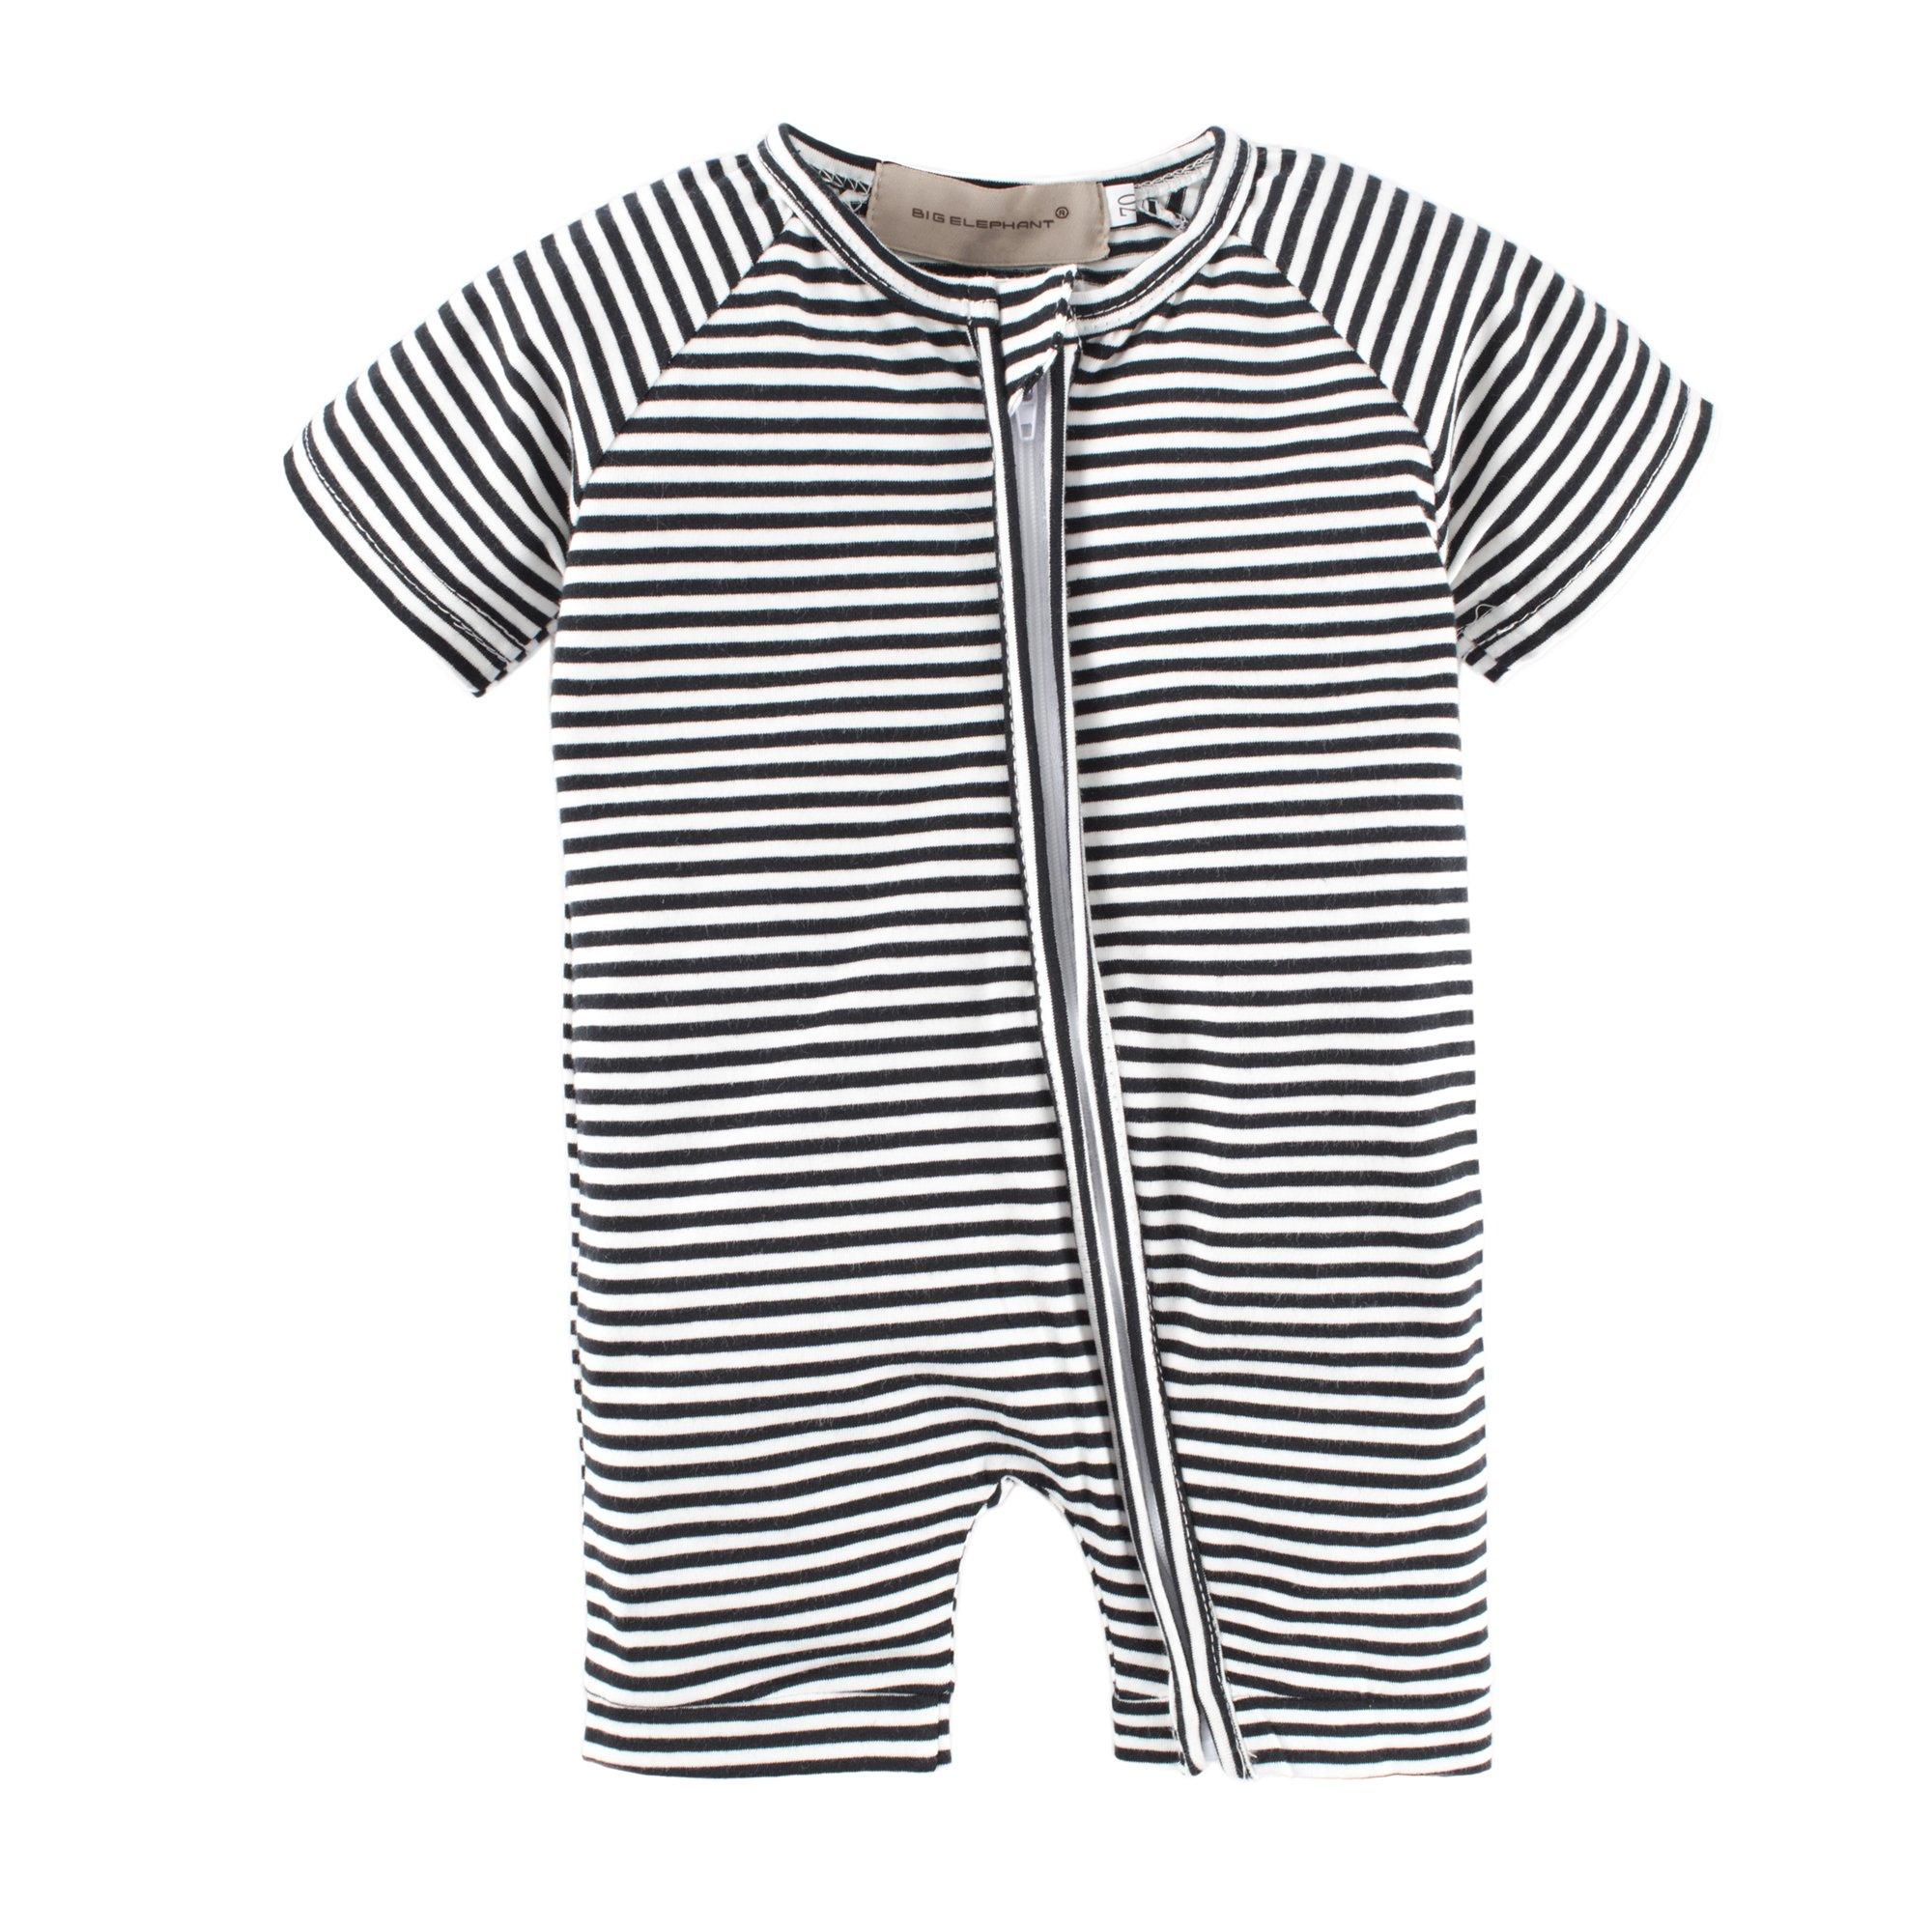 BIG ELEPHANT Baby Boys'1 Piece Stripe Zipper Closure Short Sleeve Romper Pajama Style A L14-66 3-6 Months